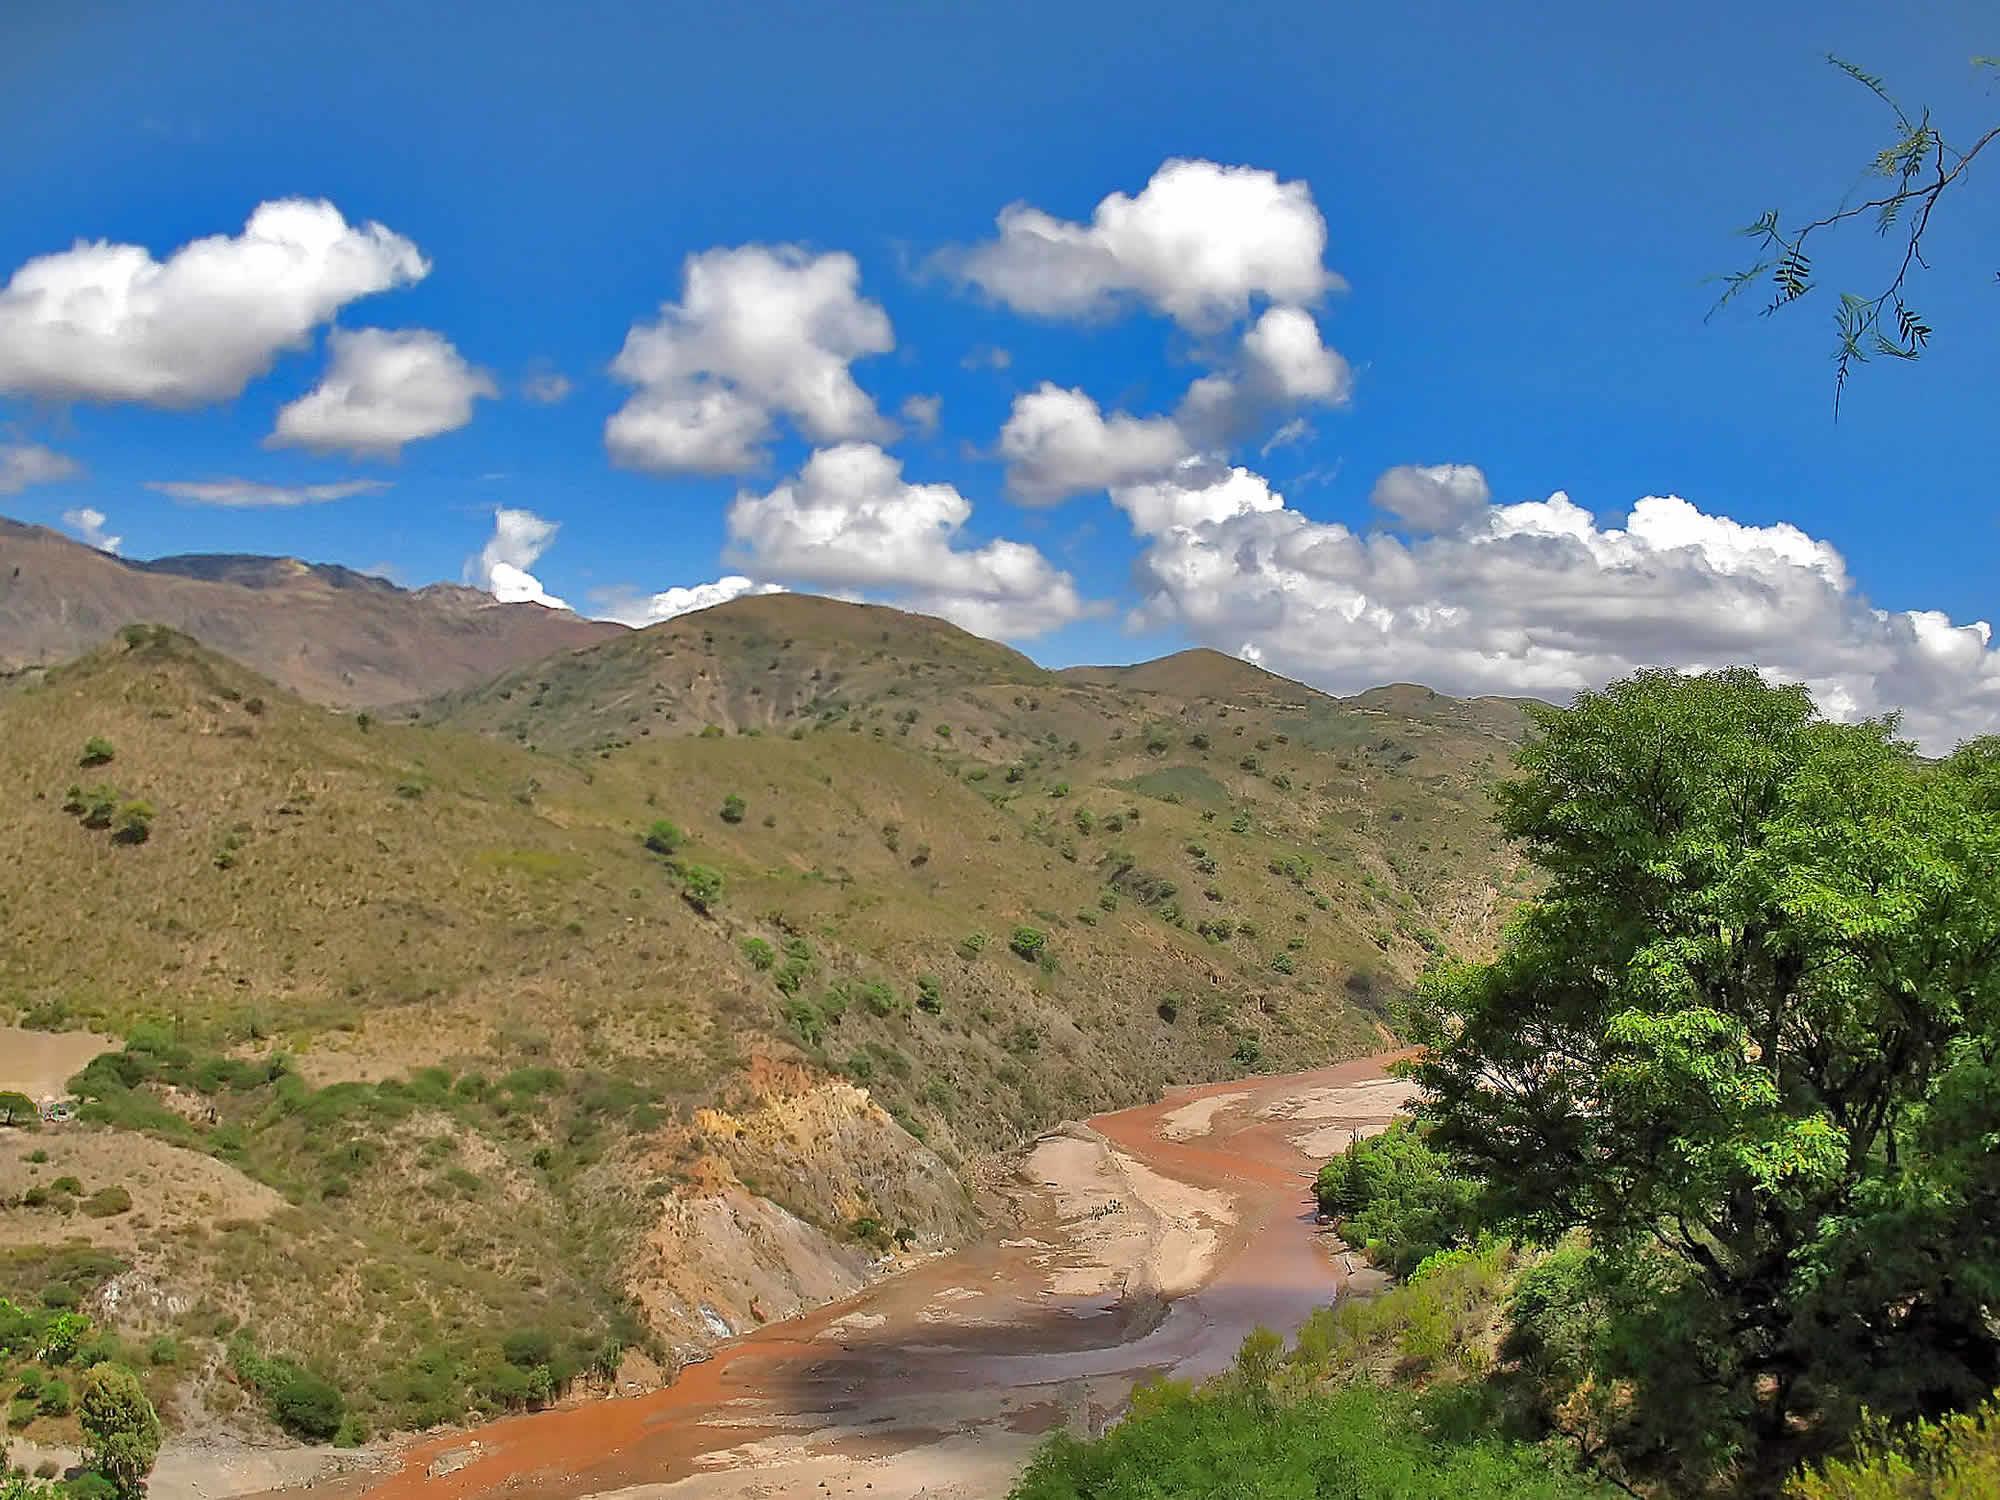 Cachimayu